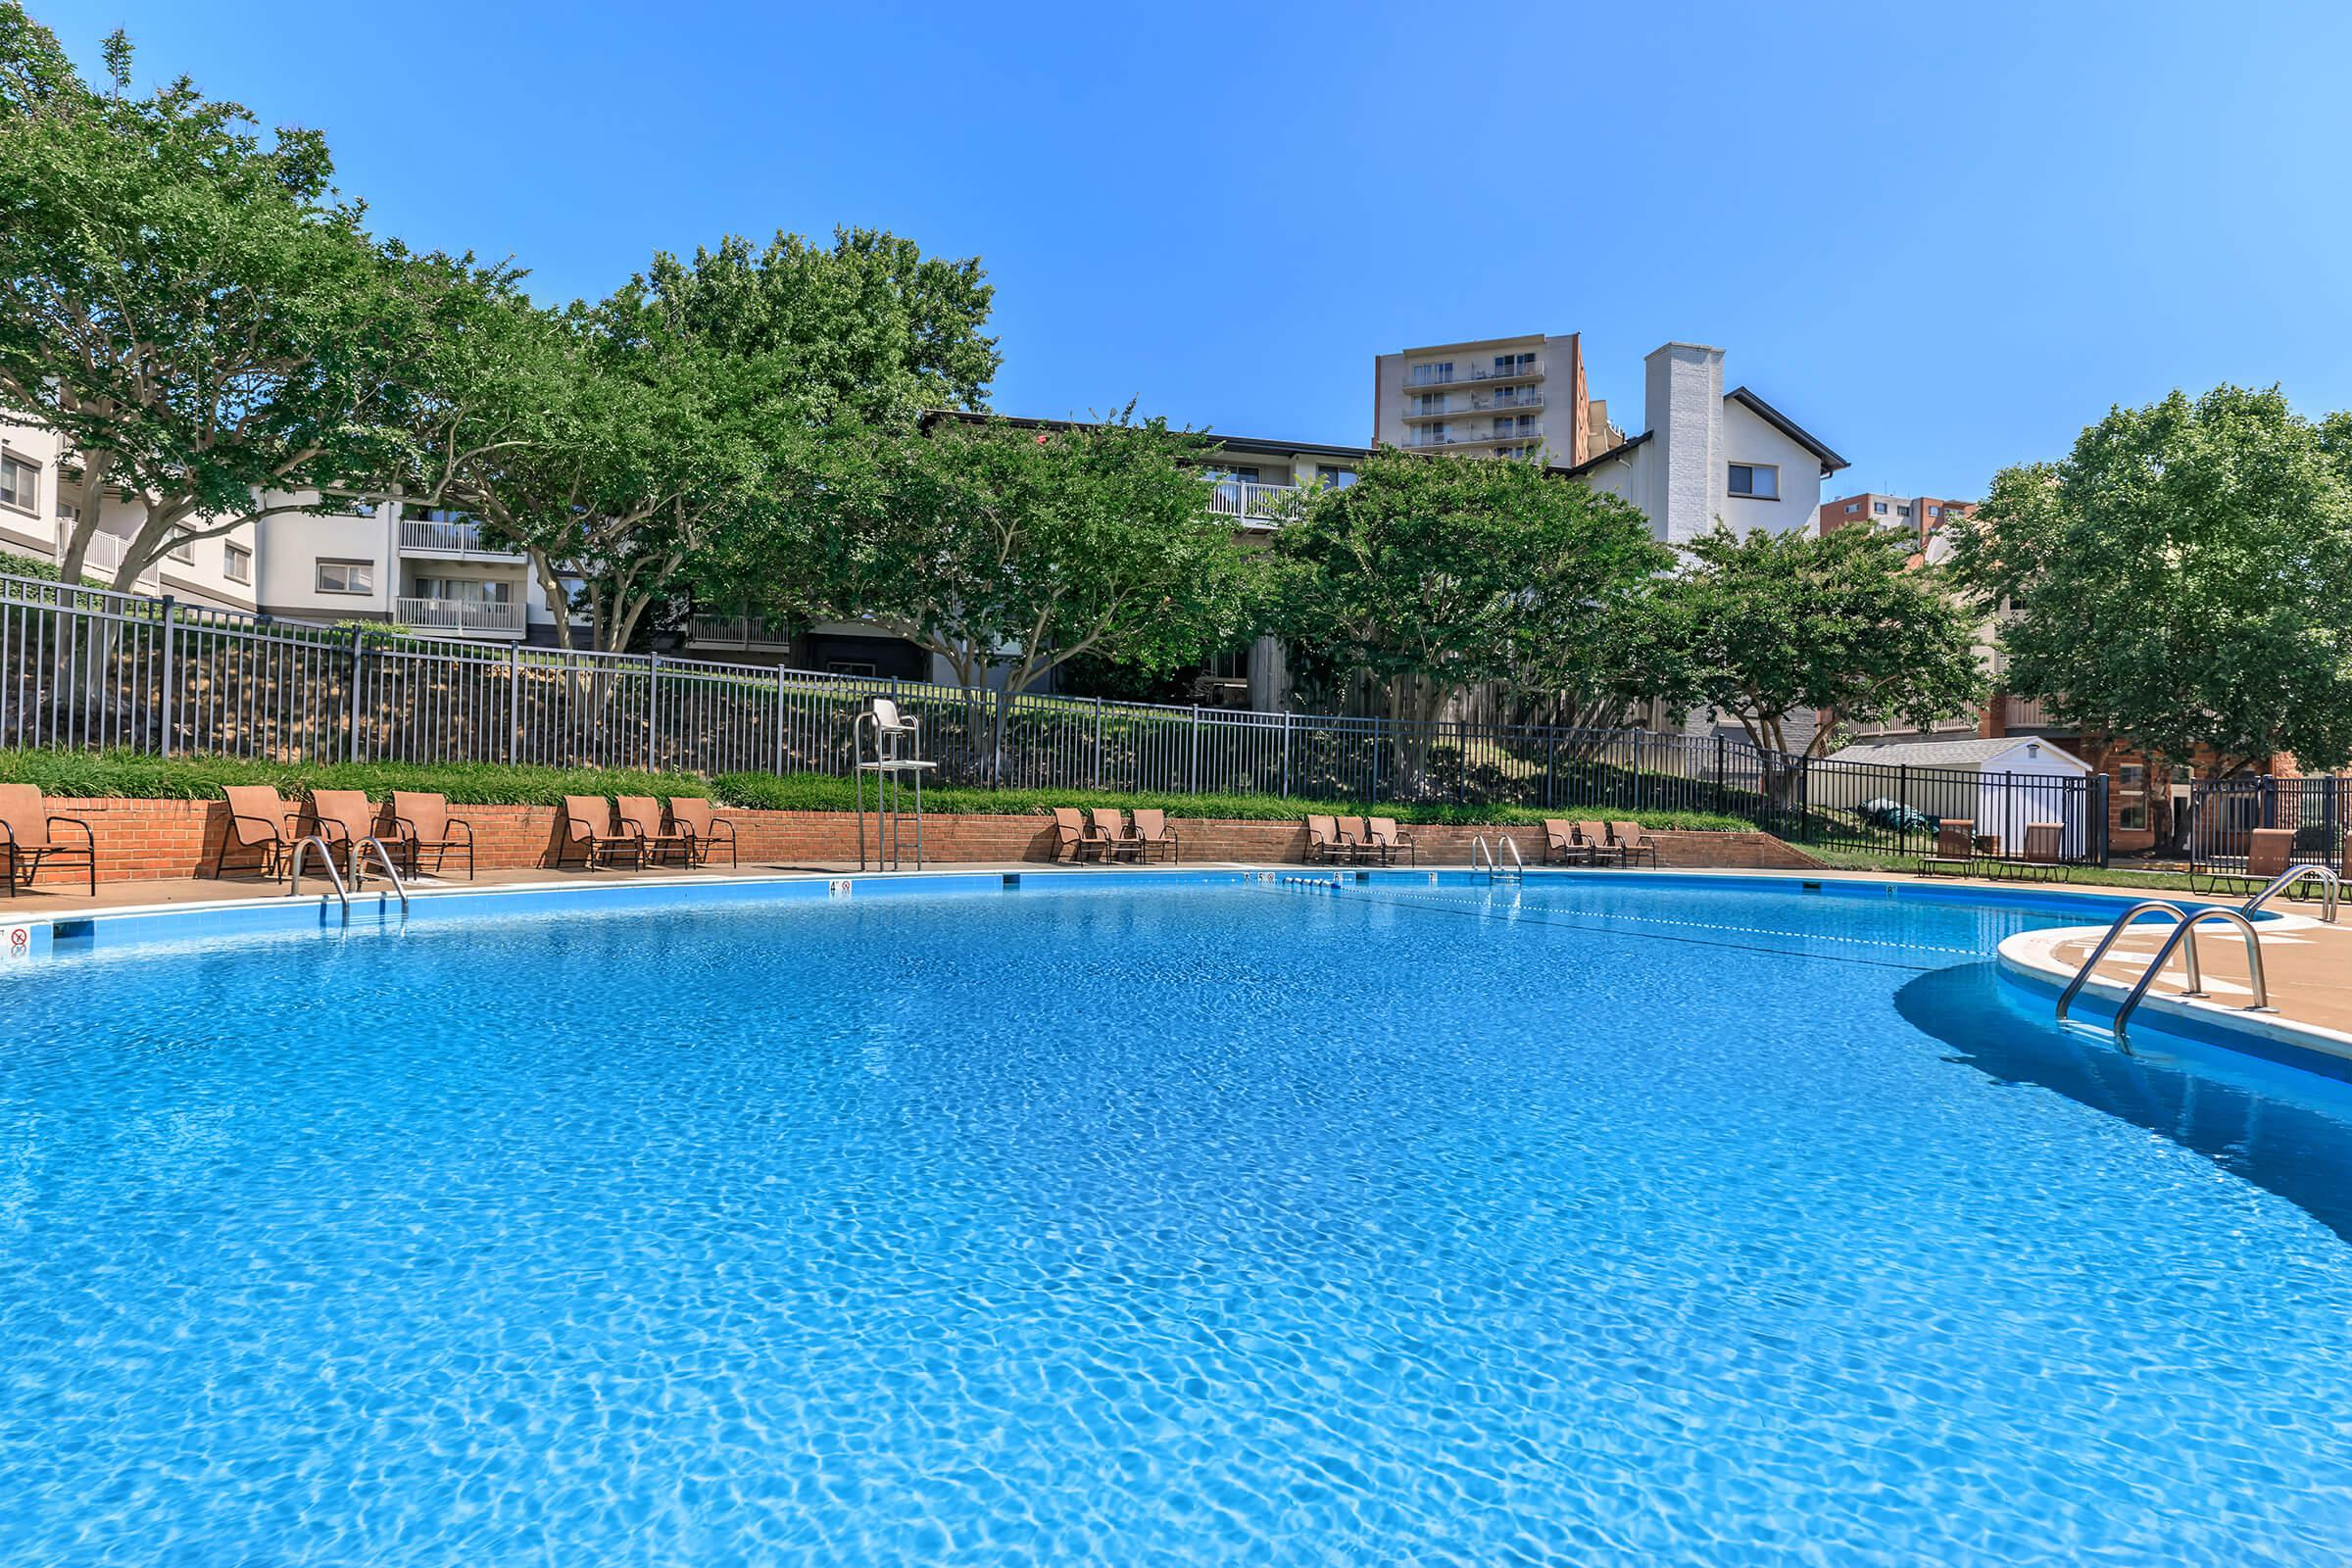 Pool at The Allante Apartments in Alexandria, VA